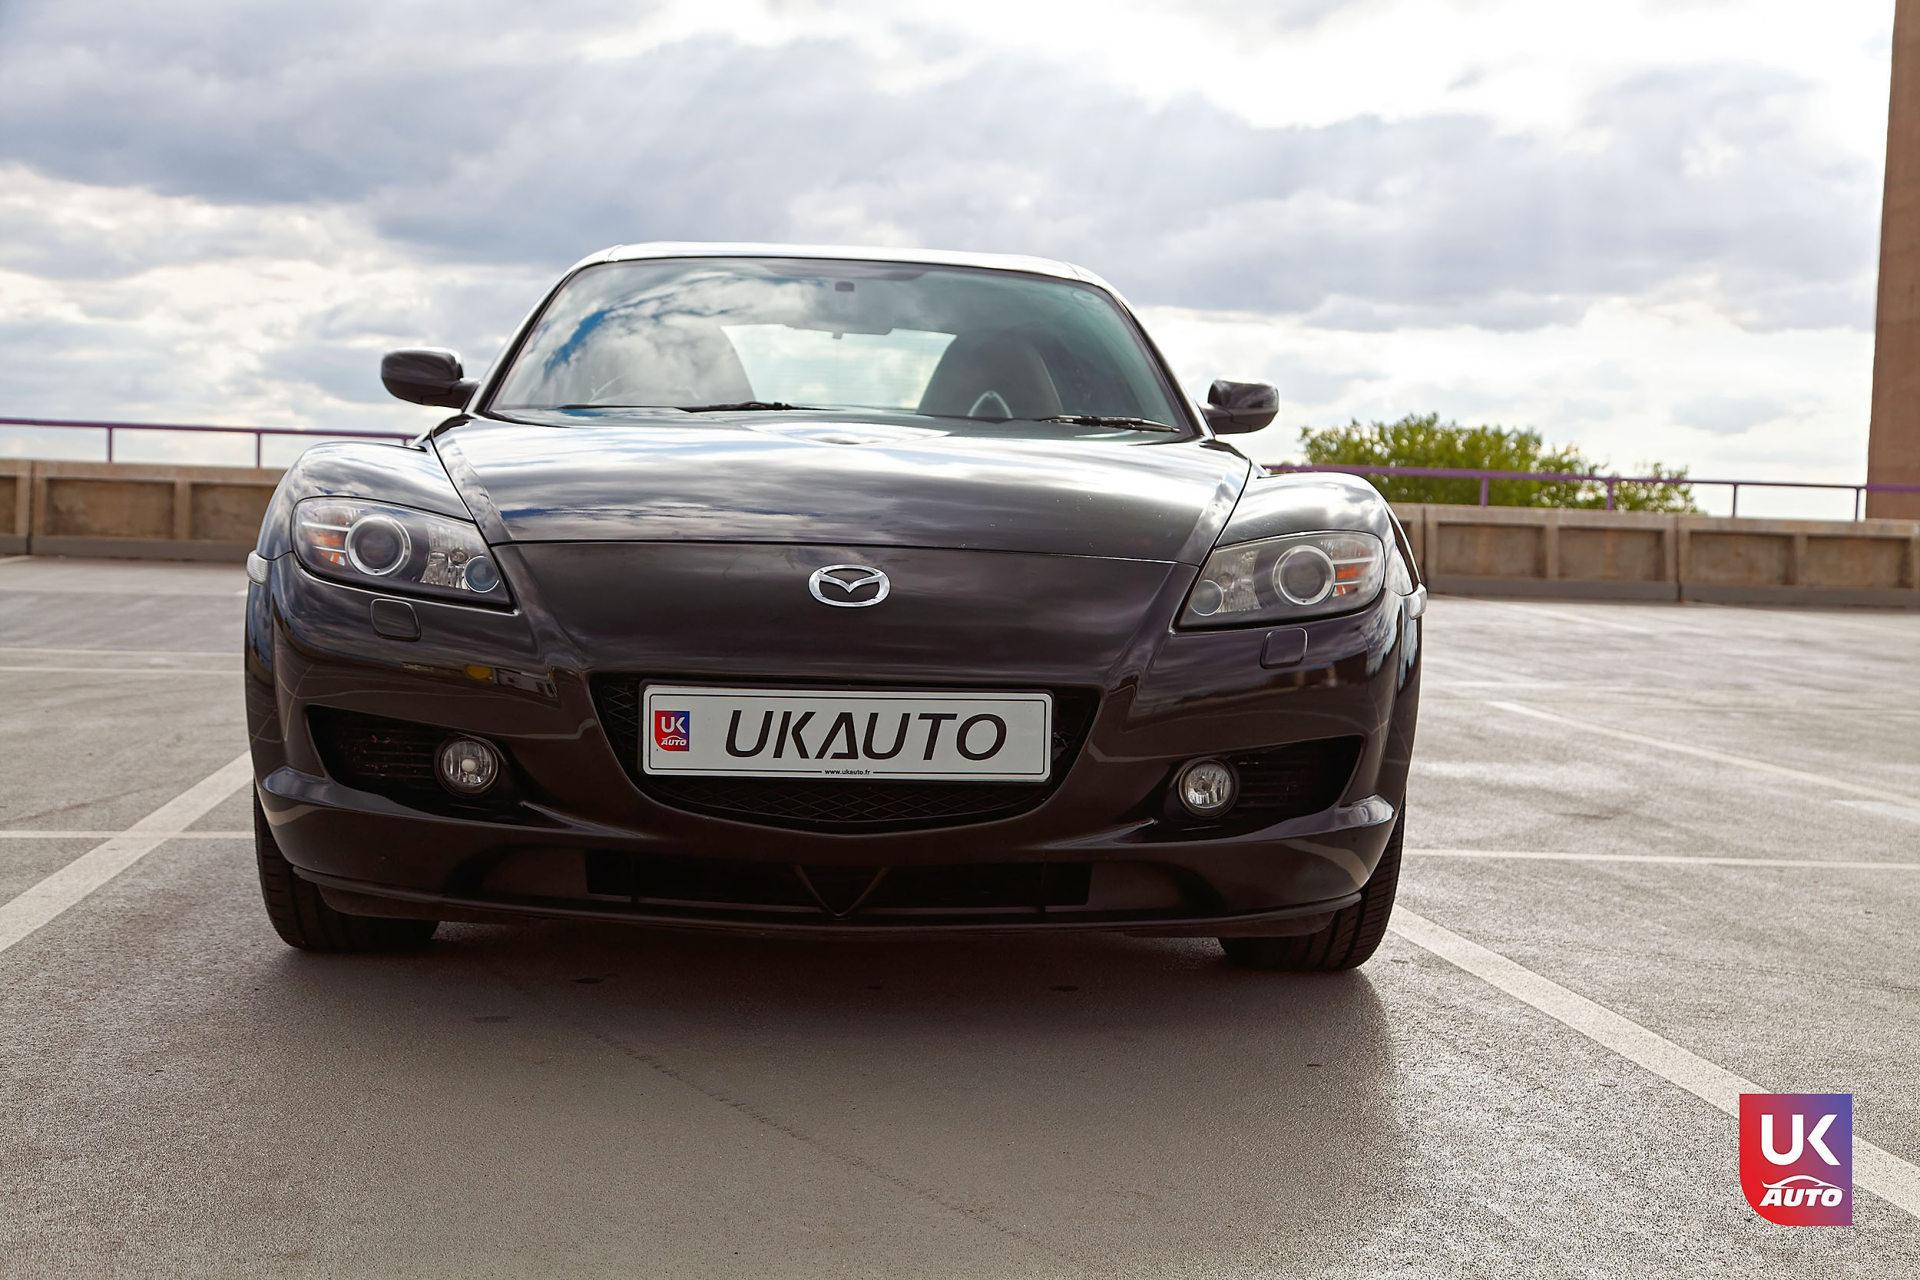 Mazda RX8 Rotary mazda angleterre mazda uk RX8 KURO import uk rhd2 DxO - Import Mazda RX8 KURO ROTARY depuis Autotrader par UKAUTO site annonces UK rhd Felicitation a Dimitri